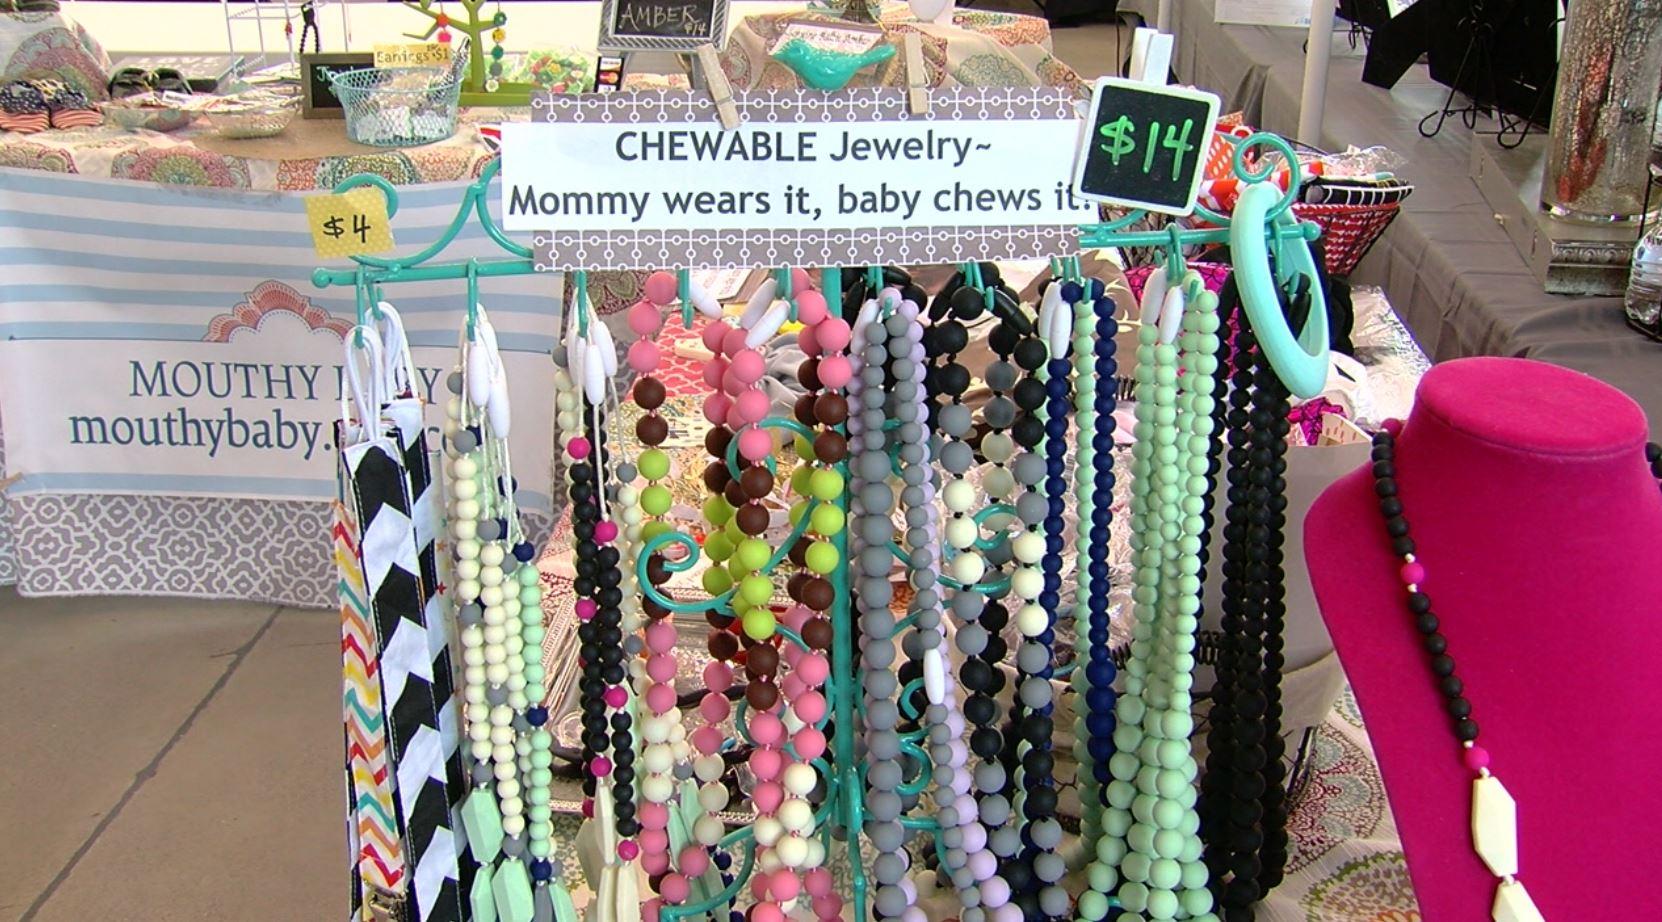 pregnancy expo web_1518304026686.JPG.jpg